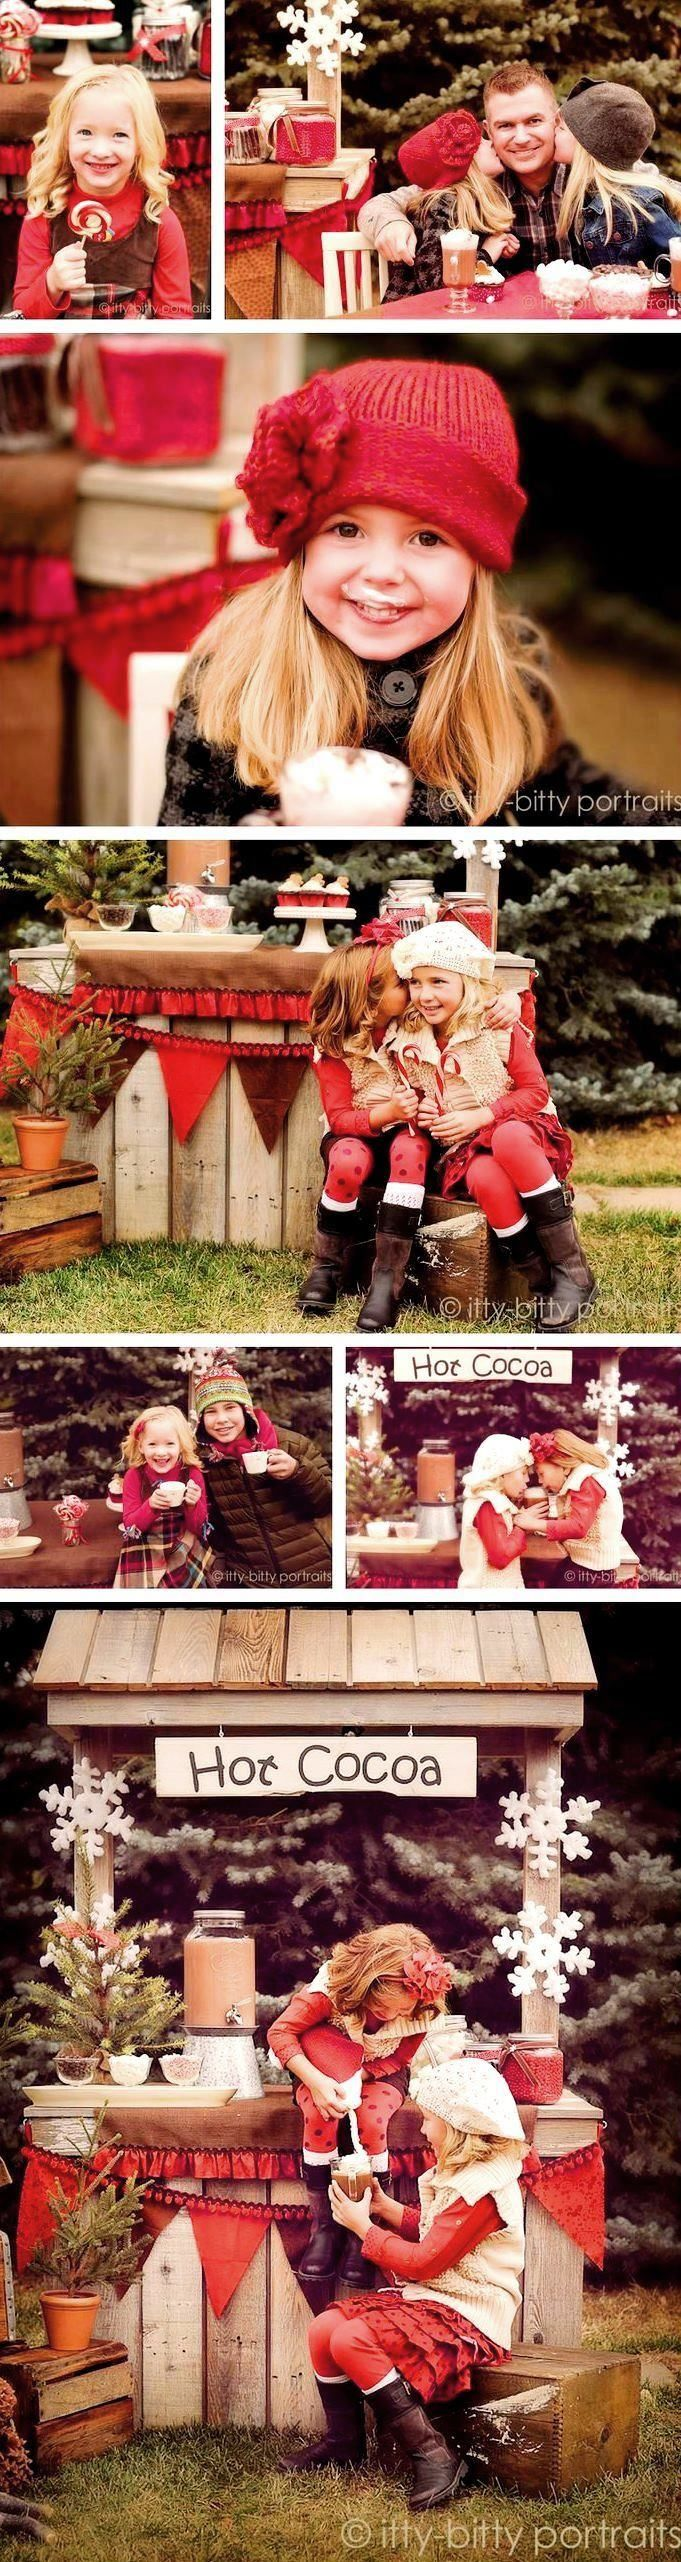 #Christmas #photography hot cocoa stand #winter ToniK Joyeux Noël